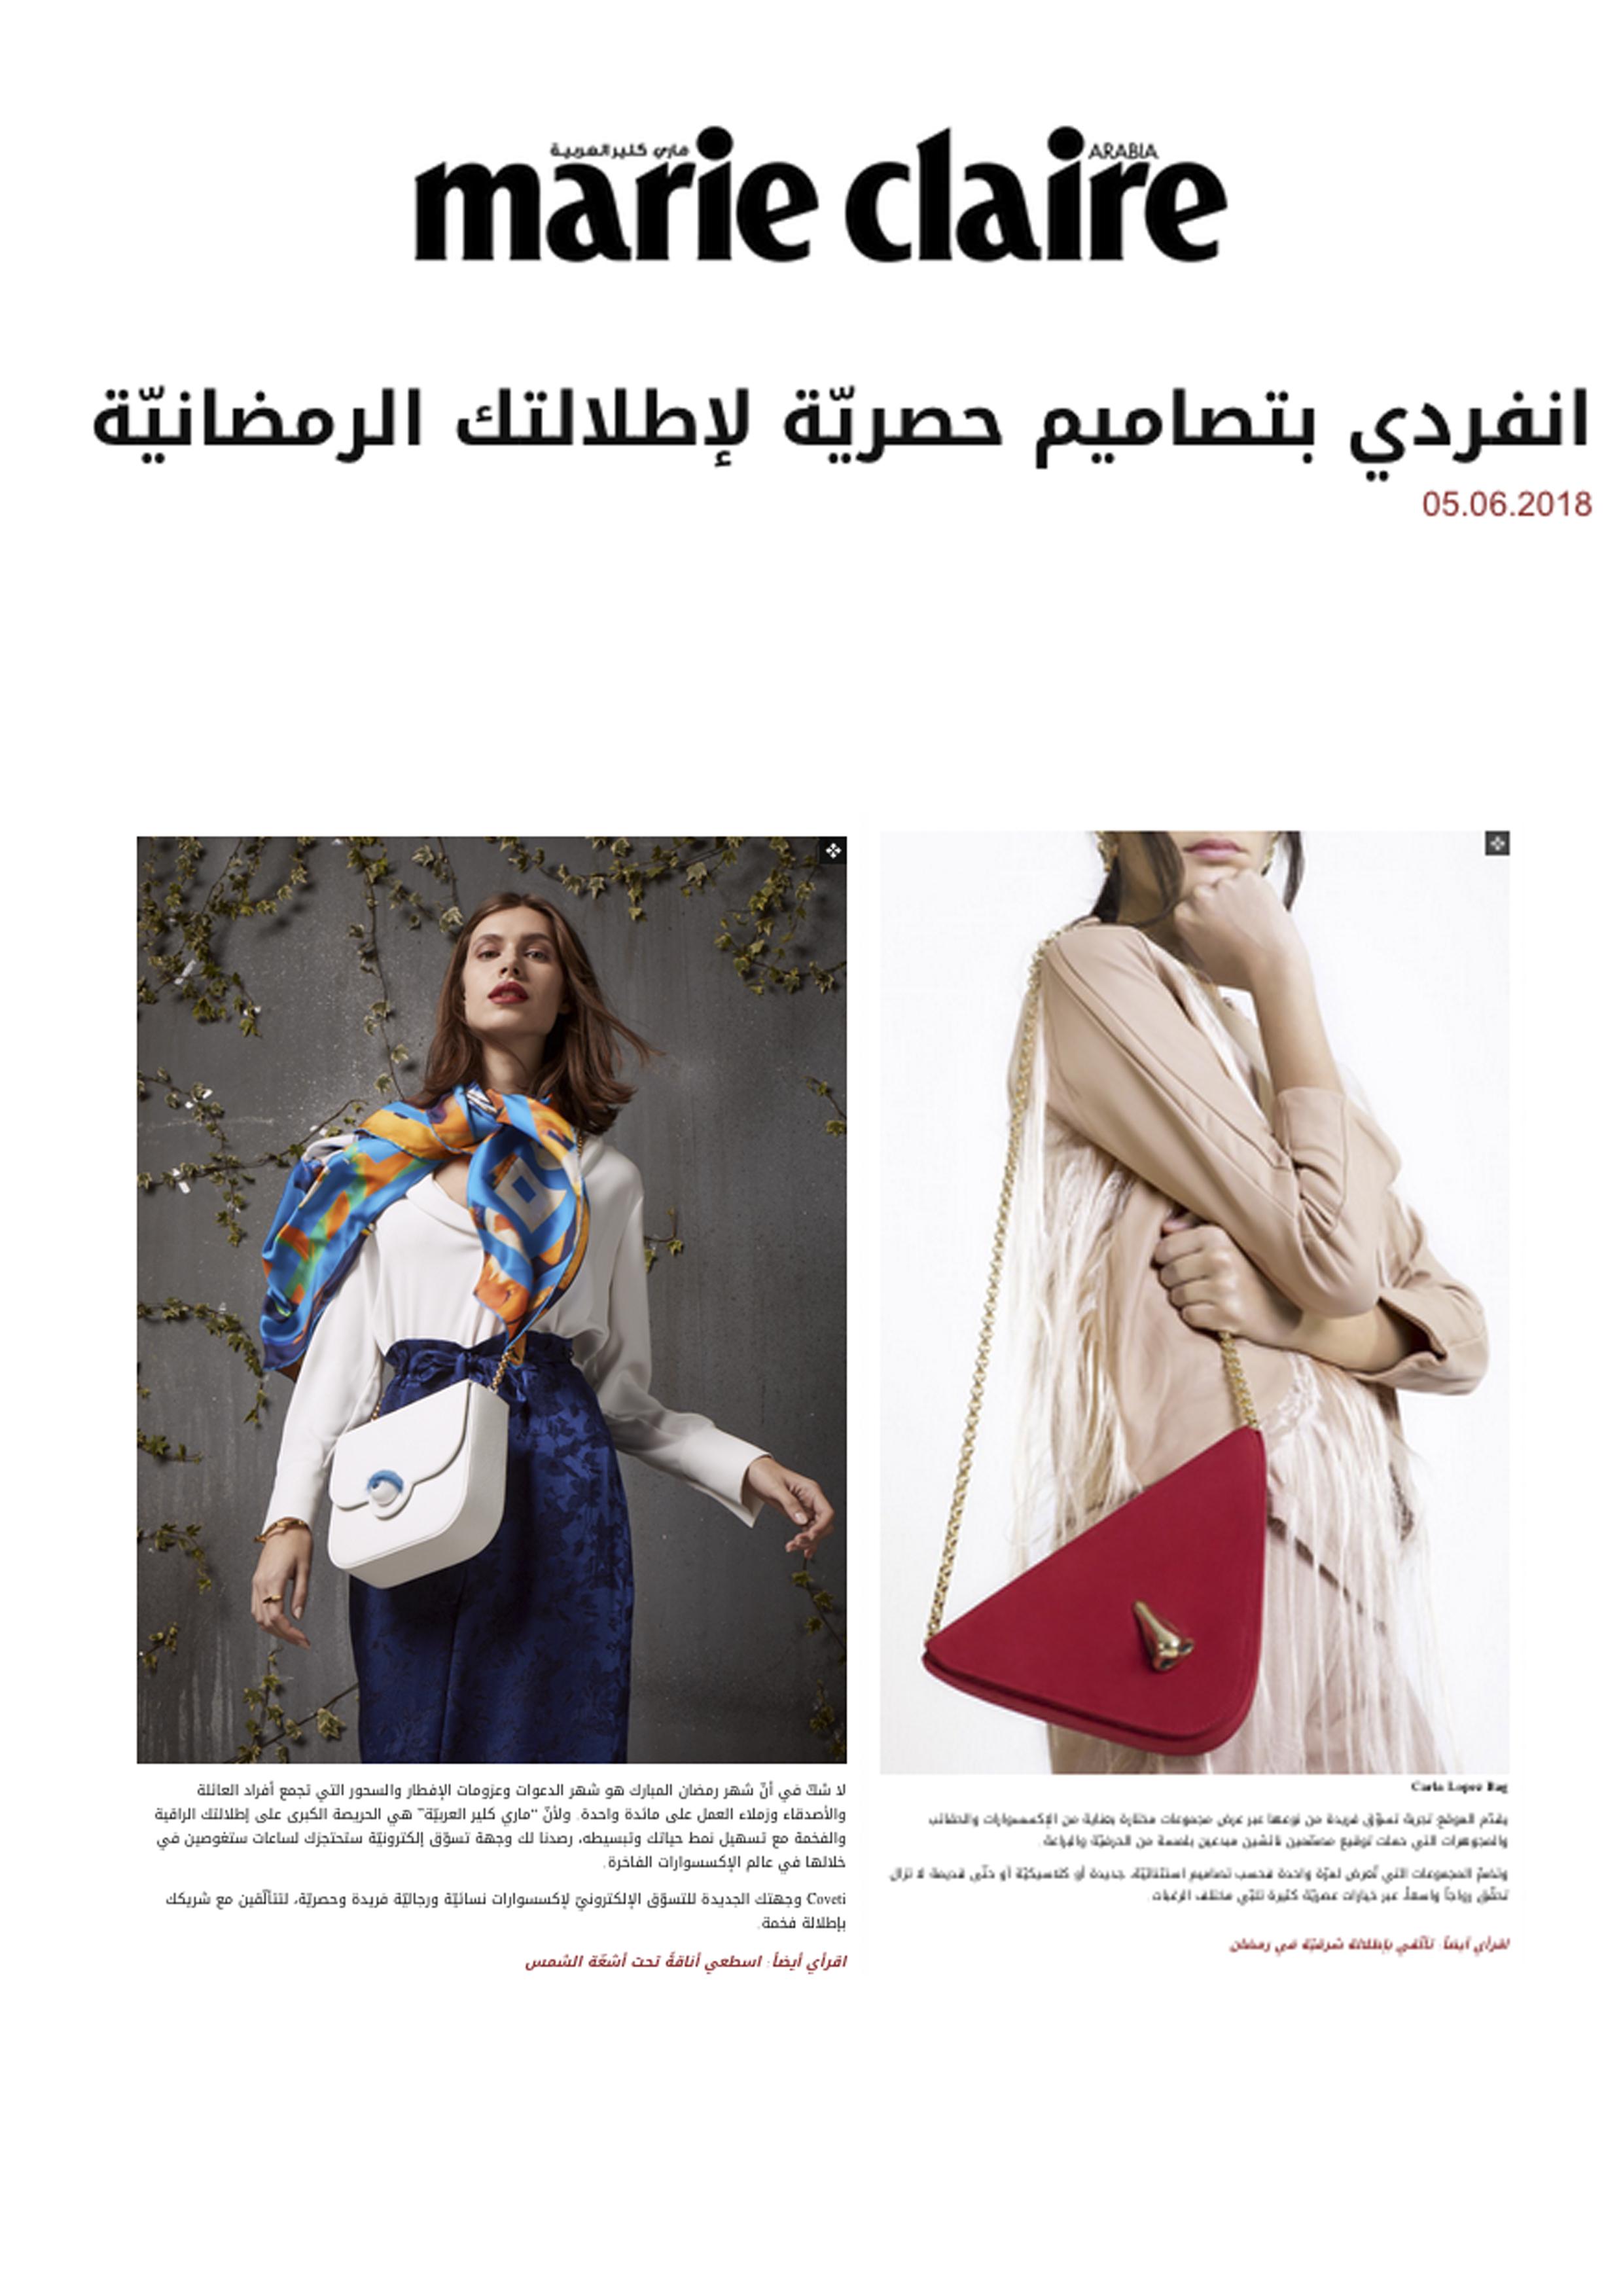 Marie Claire Arabia - carlalopez